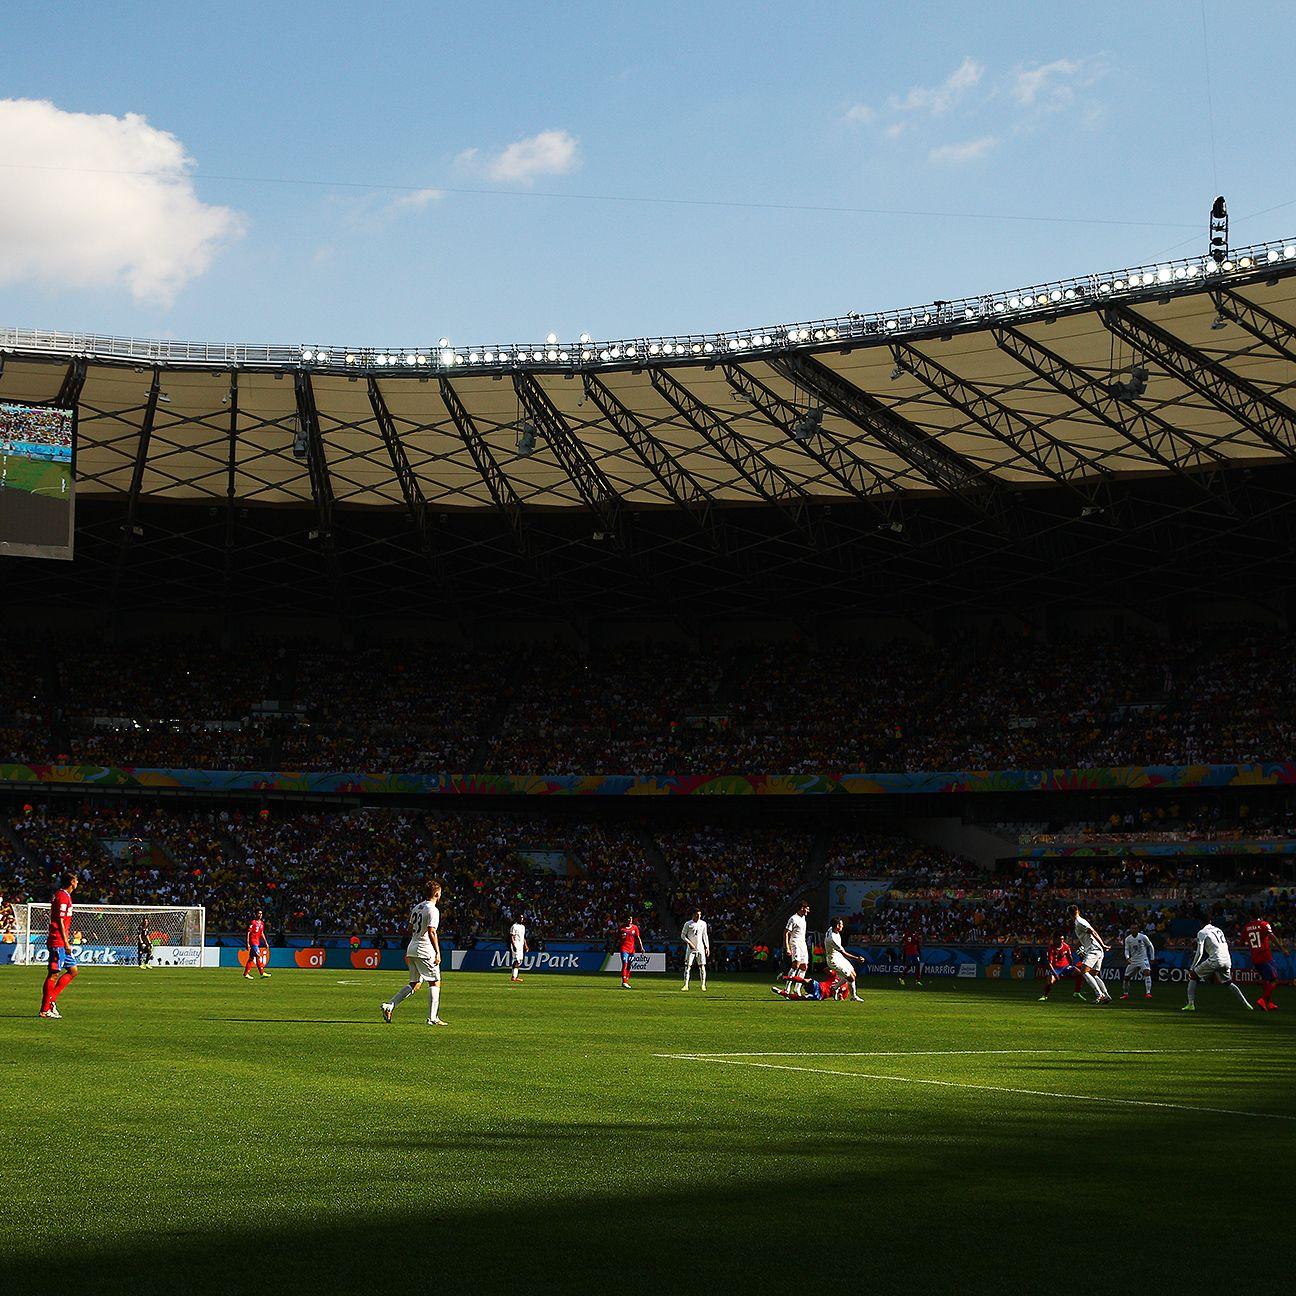 Belo Horizonte's Estadio Mineirao will play host to Saturday's big Brazil-Chile second-round clash.